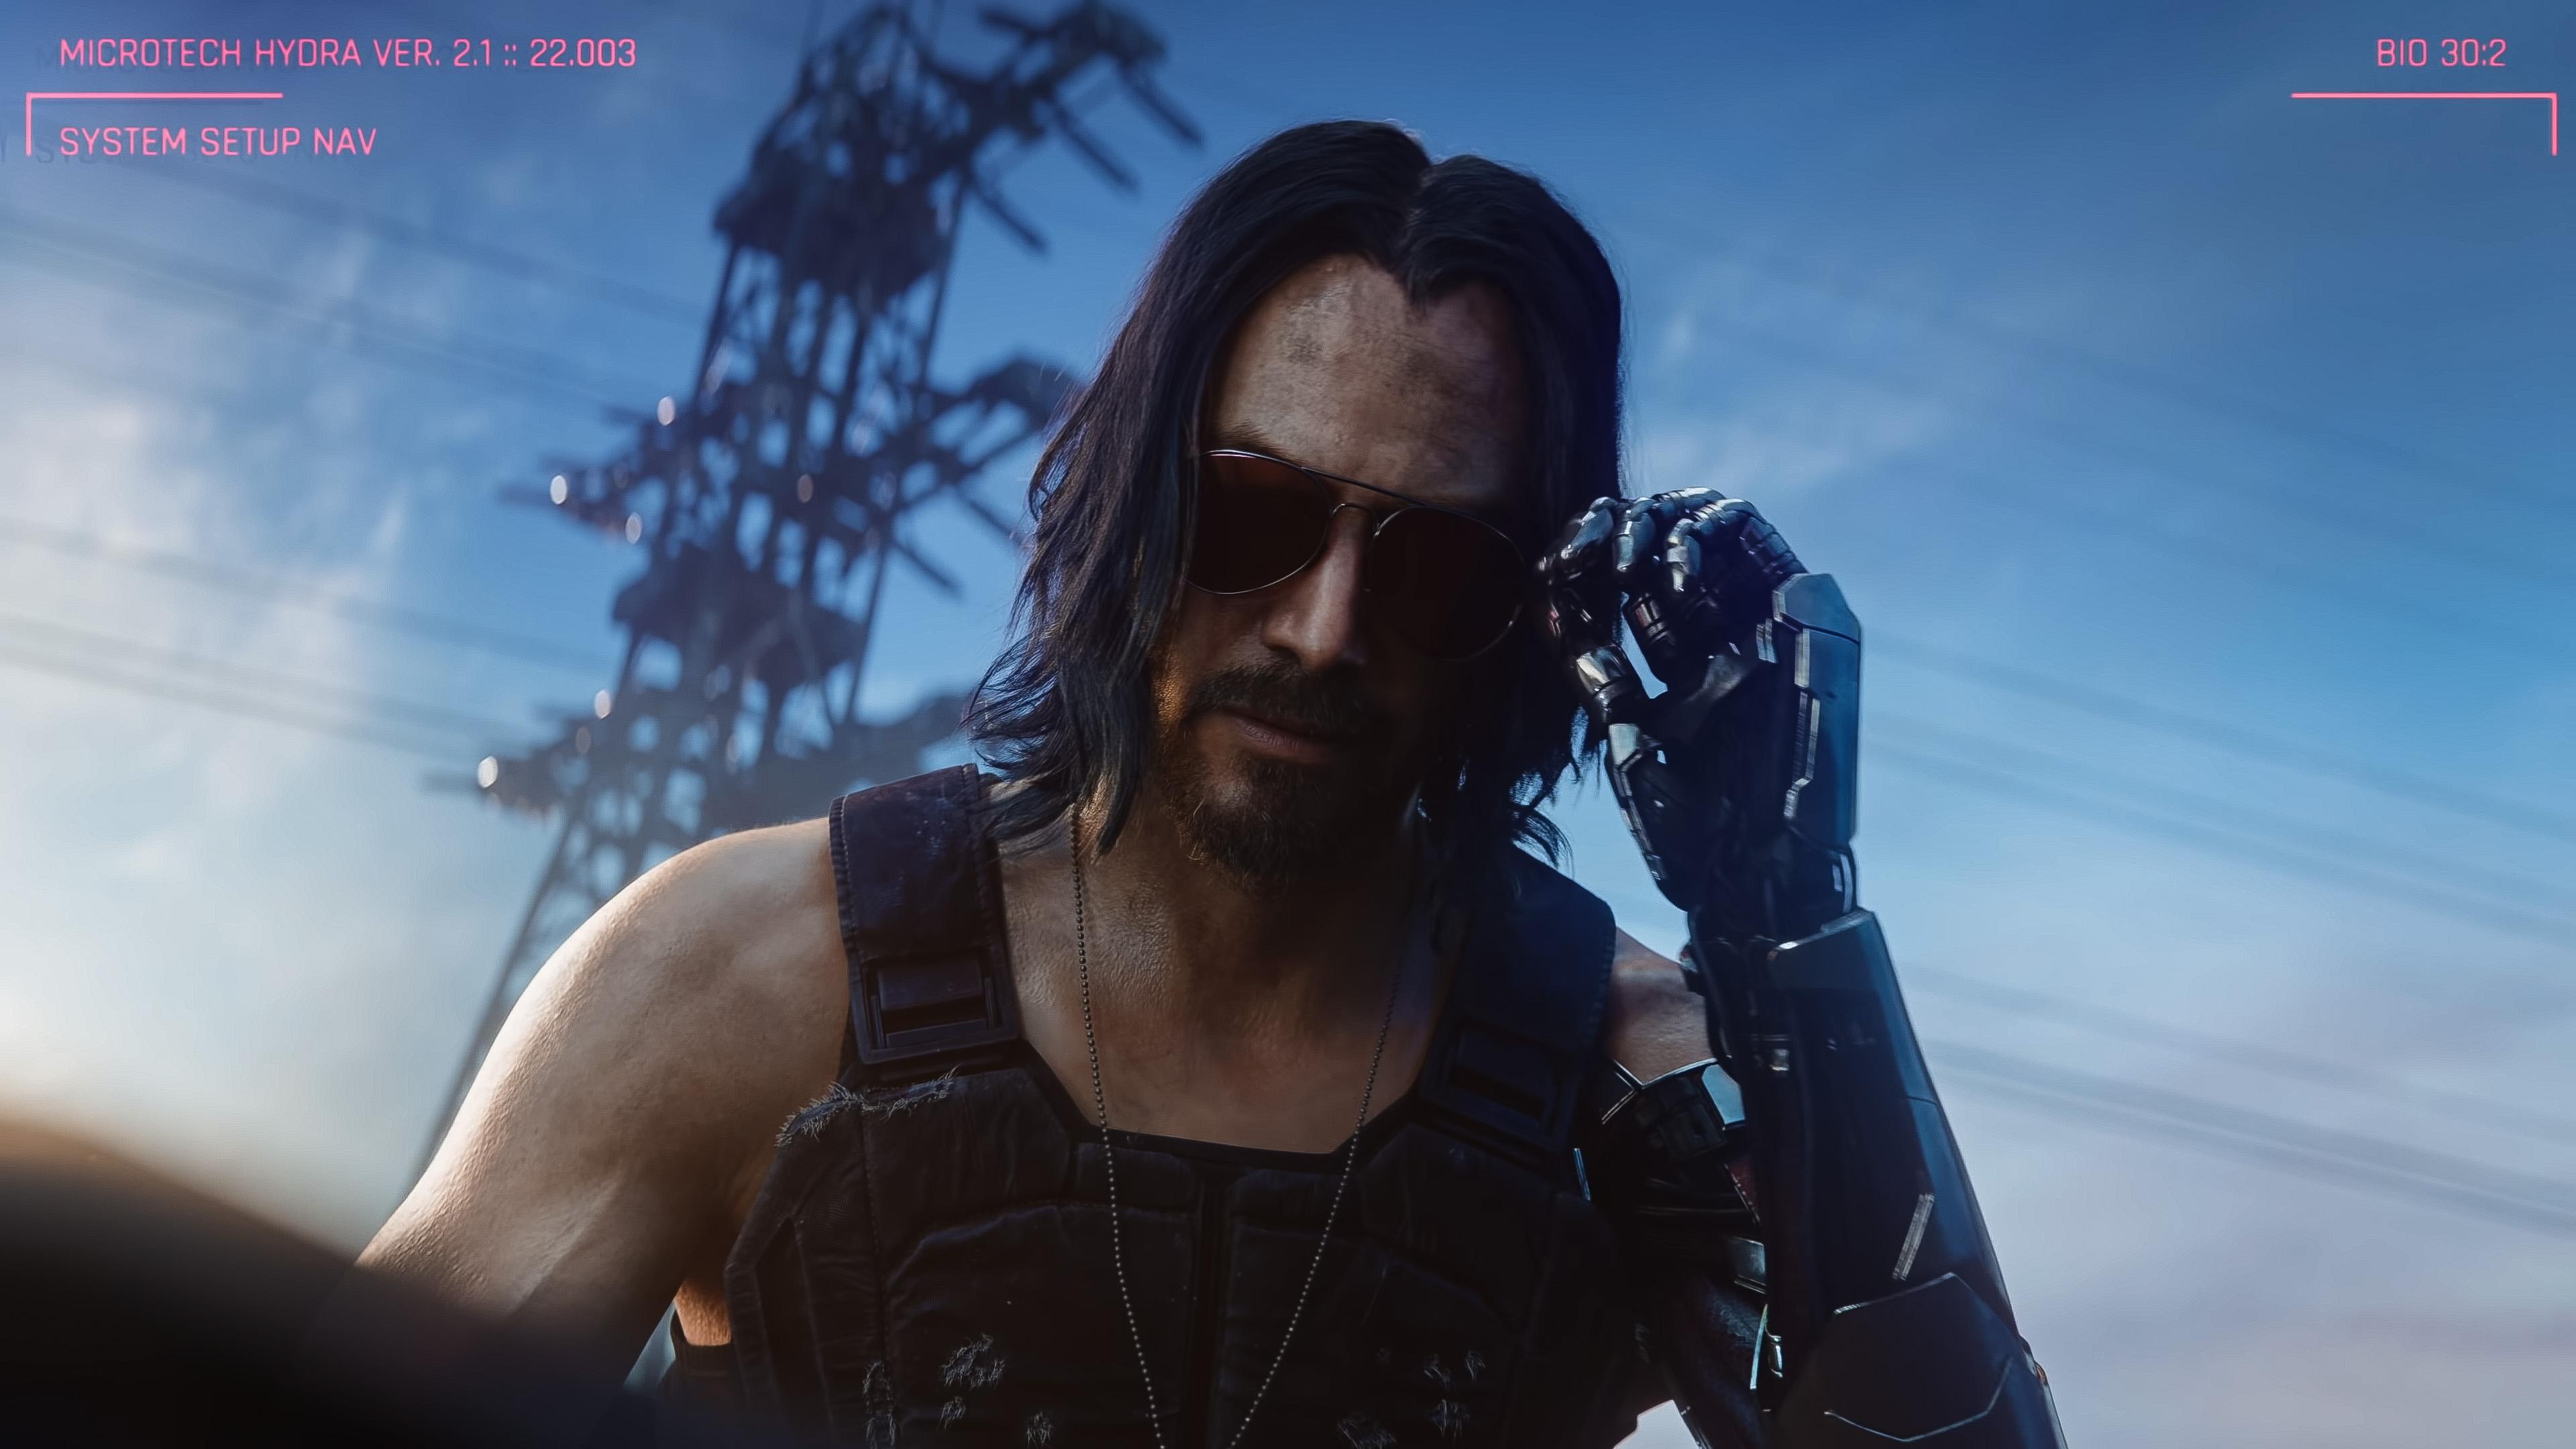 Keanu Reeves Cyberpunk 2077 Wallpapers Wallpaper Cave